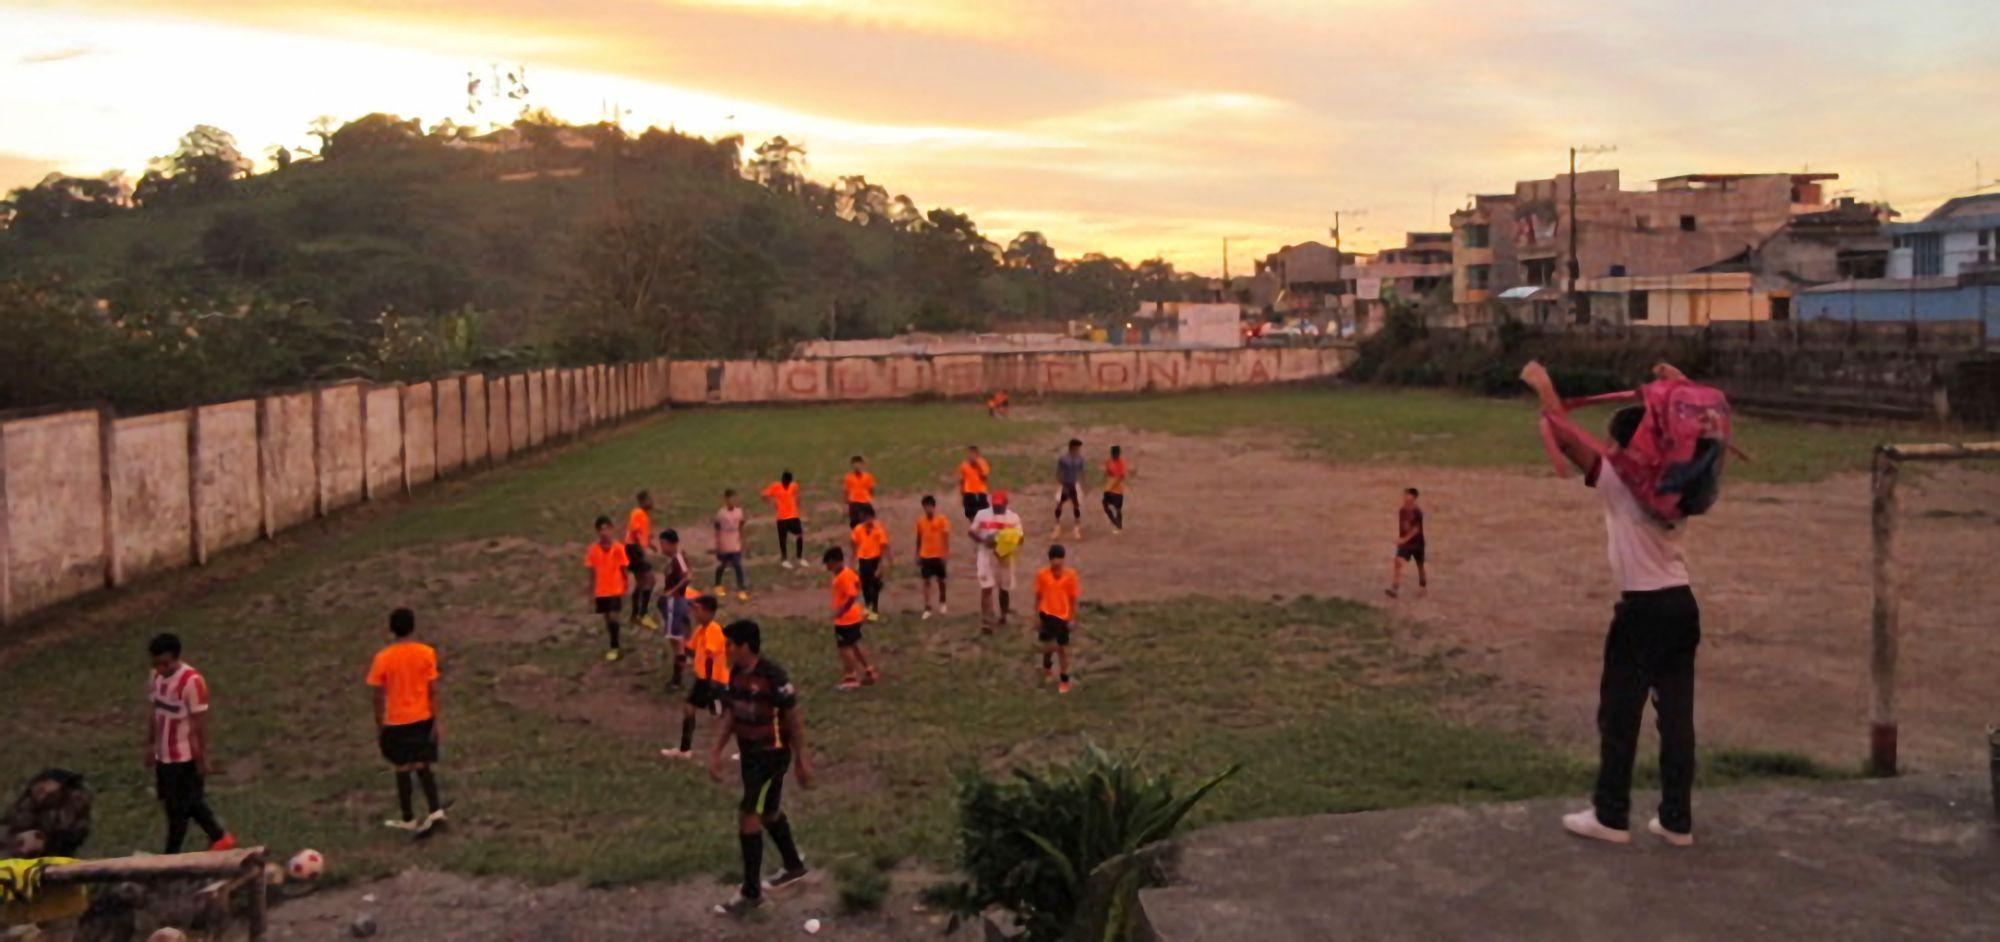 Boys football training at dusk